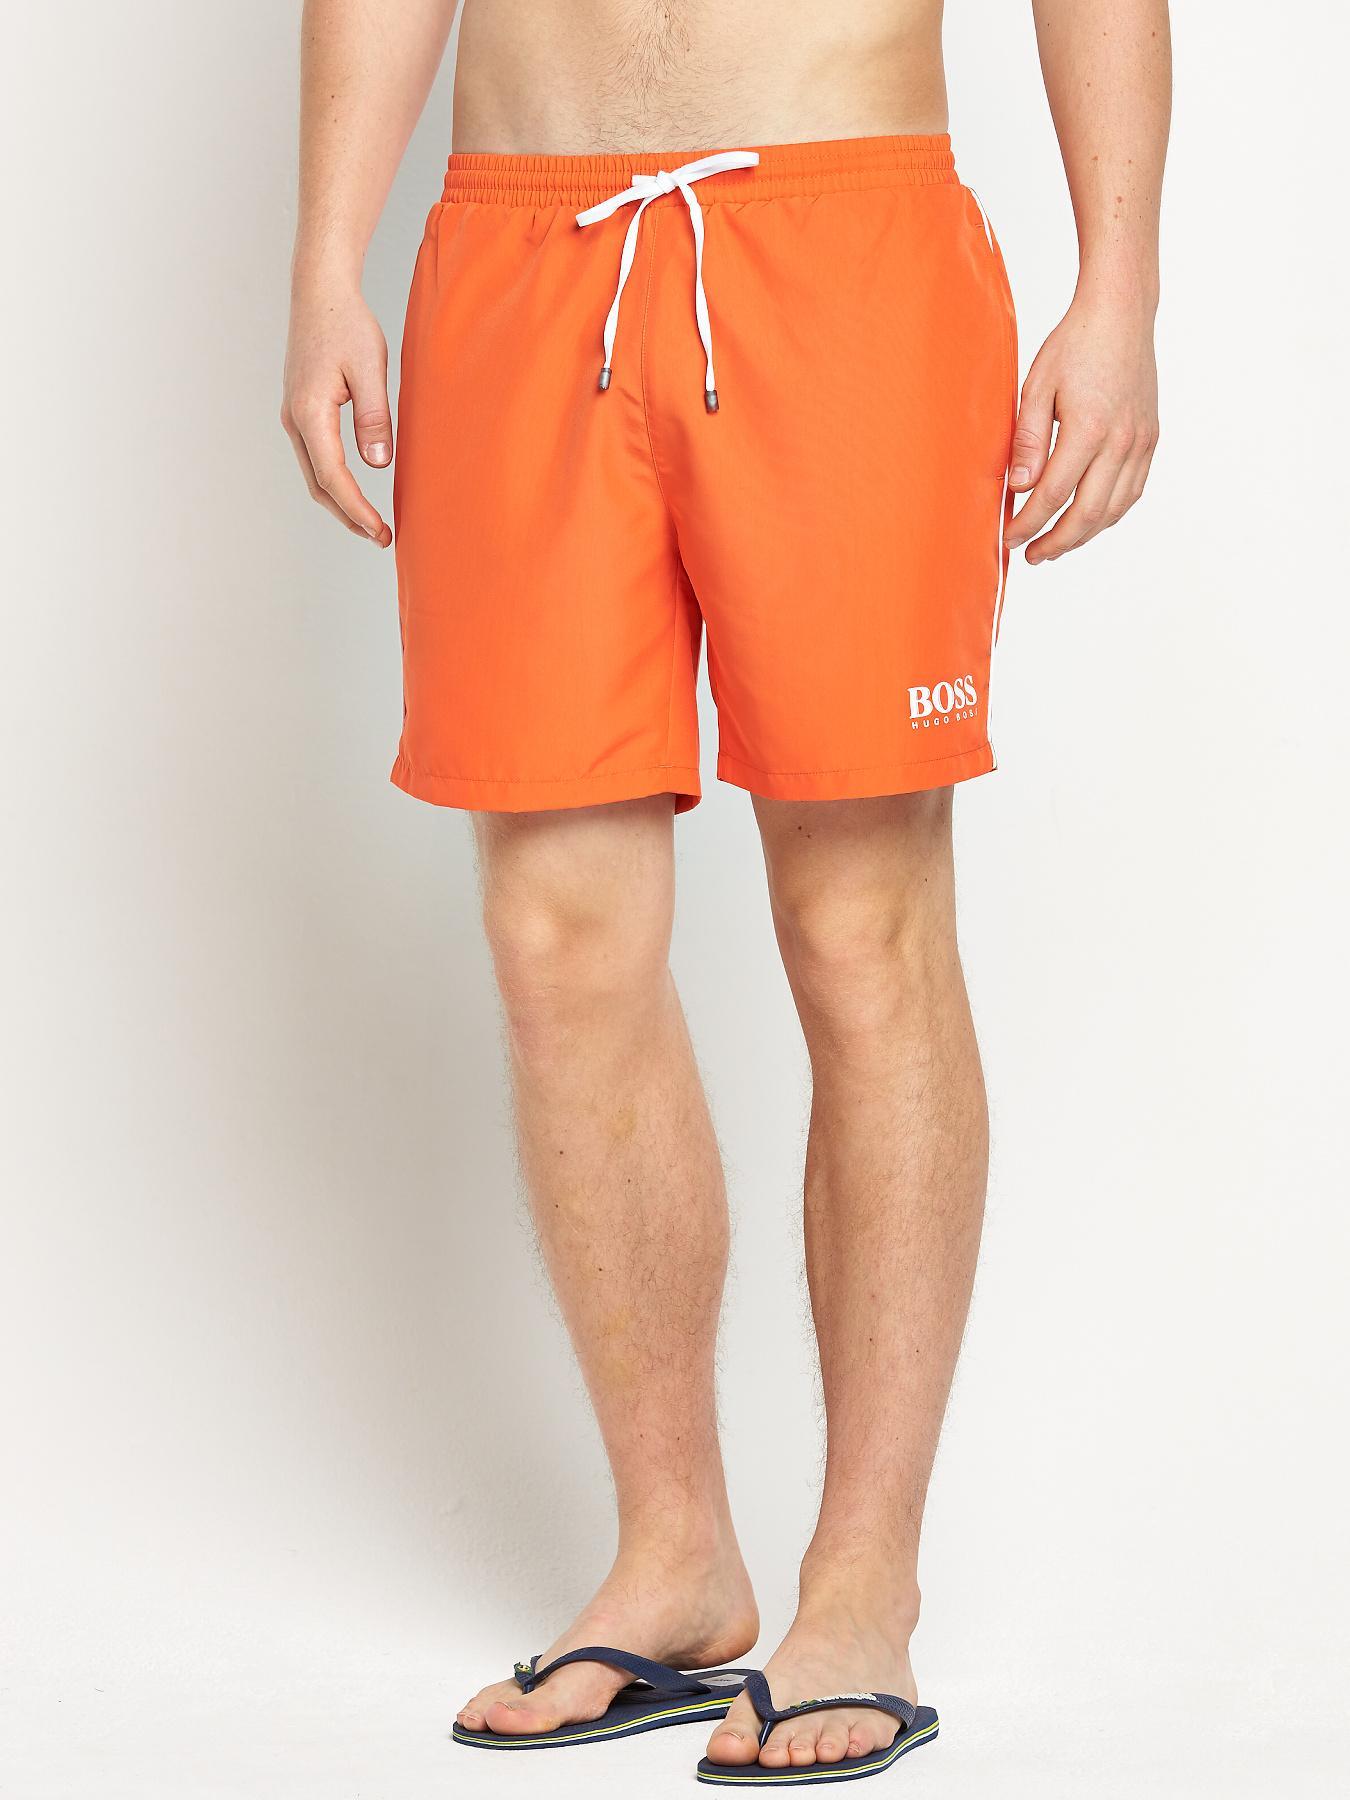 Hugo Boss Mens Starfish Swim Shorts - Orange - Orange, Orange